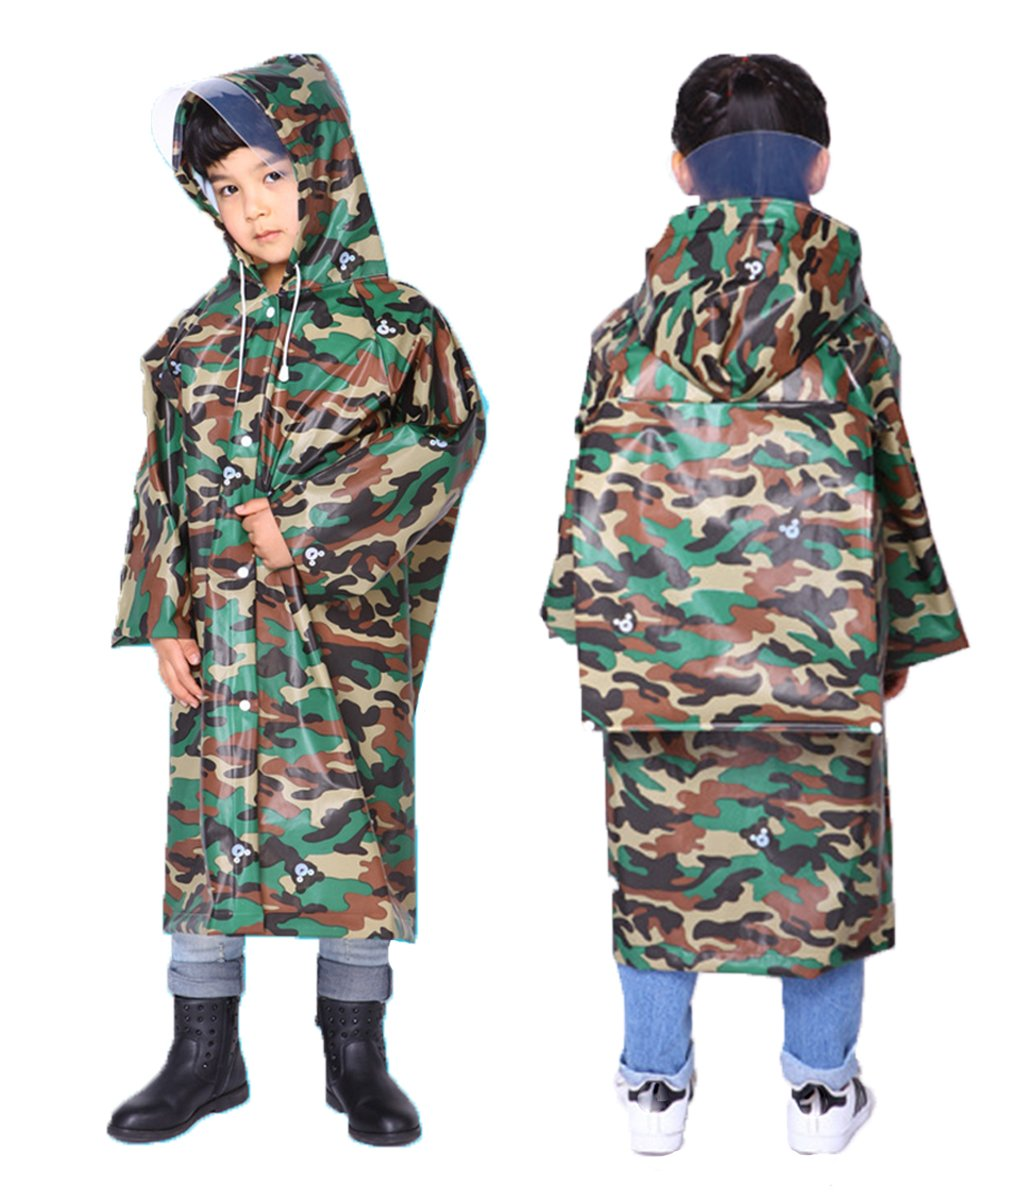 AYUBOOM Children Raincoat,Rainwear with School Bag Cover,Ages 4-14,Lightweight Rain Ponchos to Toddler, Boys,Girls (M)